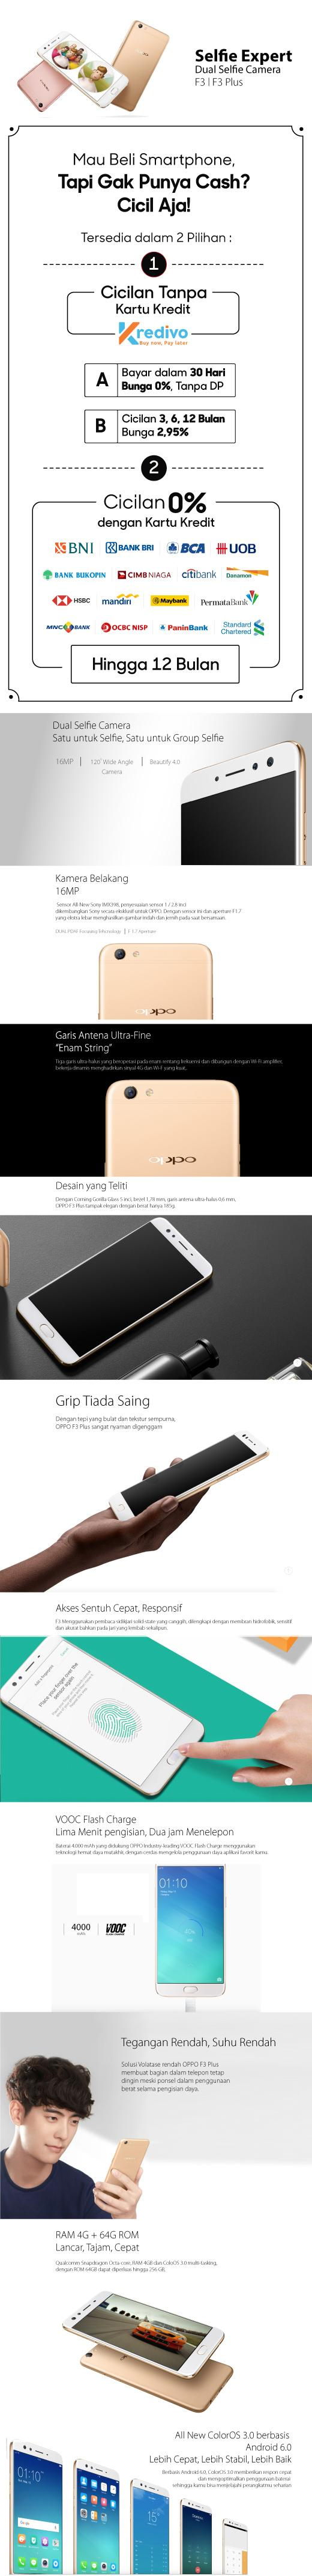 Fs Oppo F3 Plus Smartphone Dual Selfie Camera 4gb 64gb Gold Garansi Resmi Indonesia 1 Tahun Layar 6 Inch Cicilan